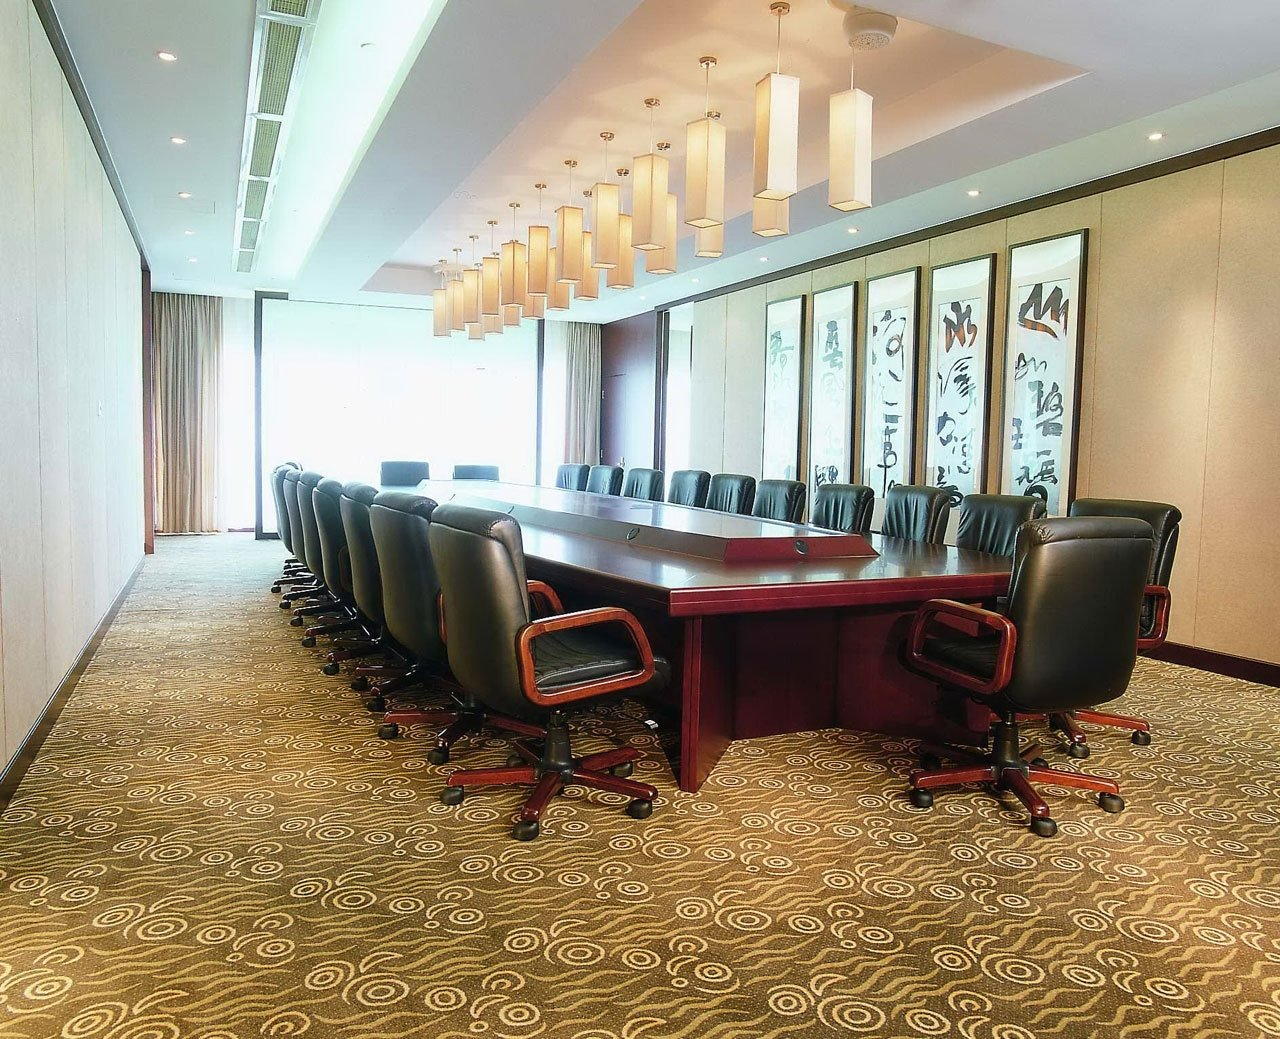 10 Fashionable Wall To Wall Carpet Ideas wall carpet office emilie carpet rugsemilie carpet rugs 2020